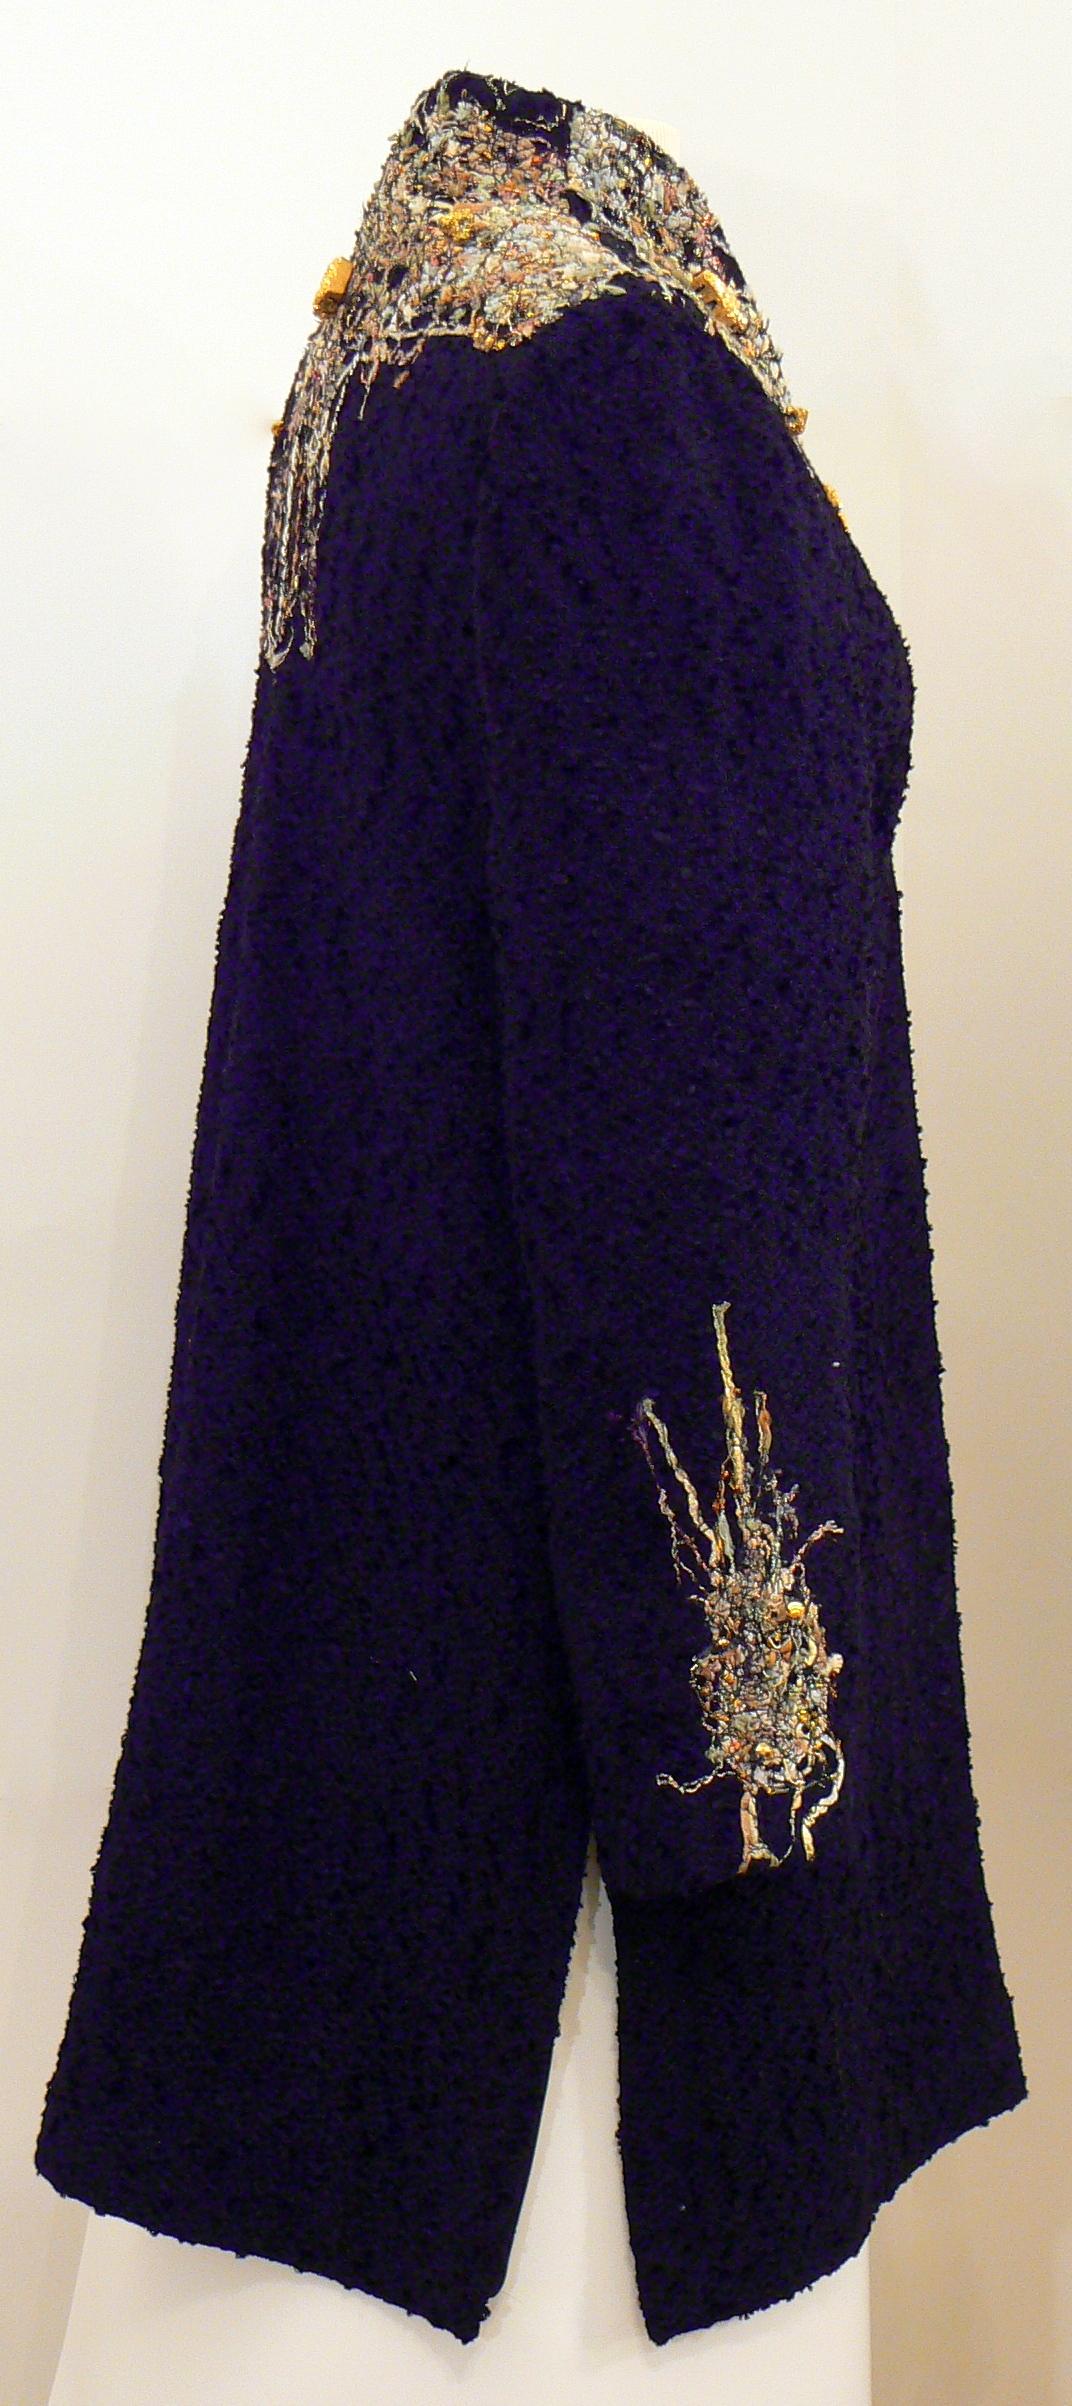 Handwoven Clothing, Coats, Kathleen Weir-West, 30-001.JPG